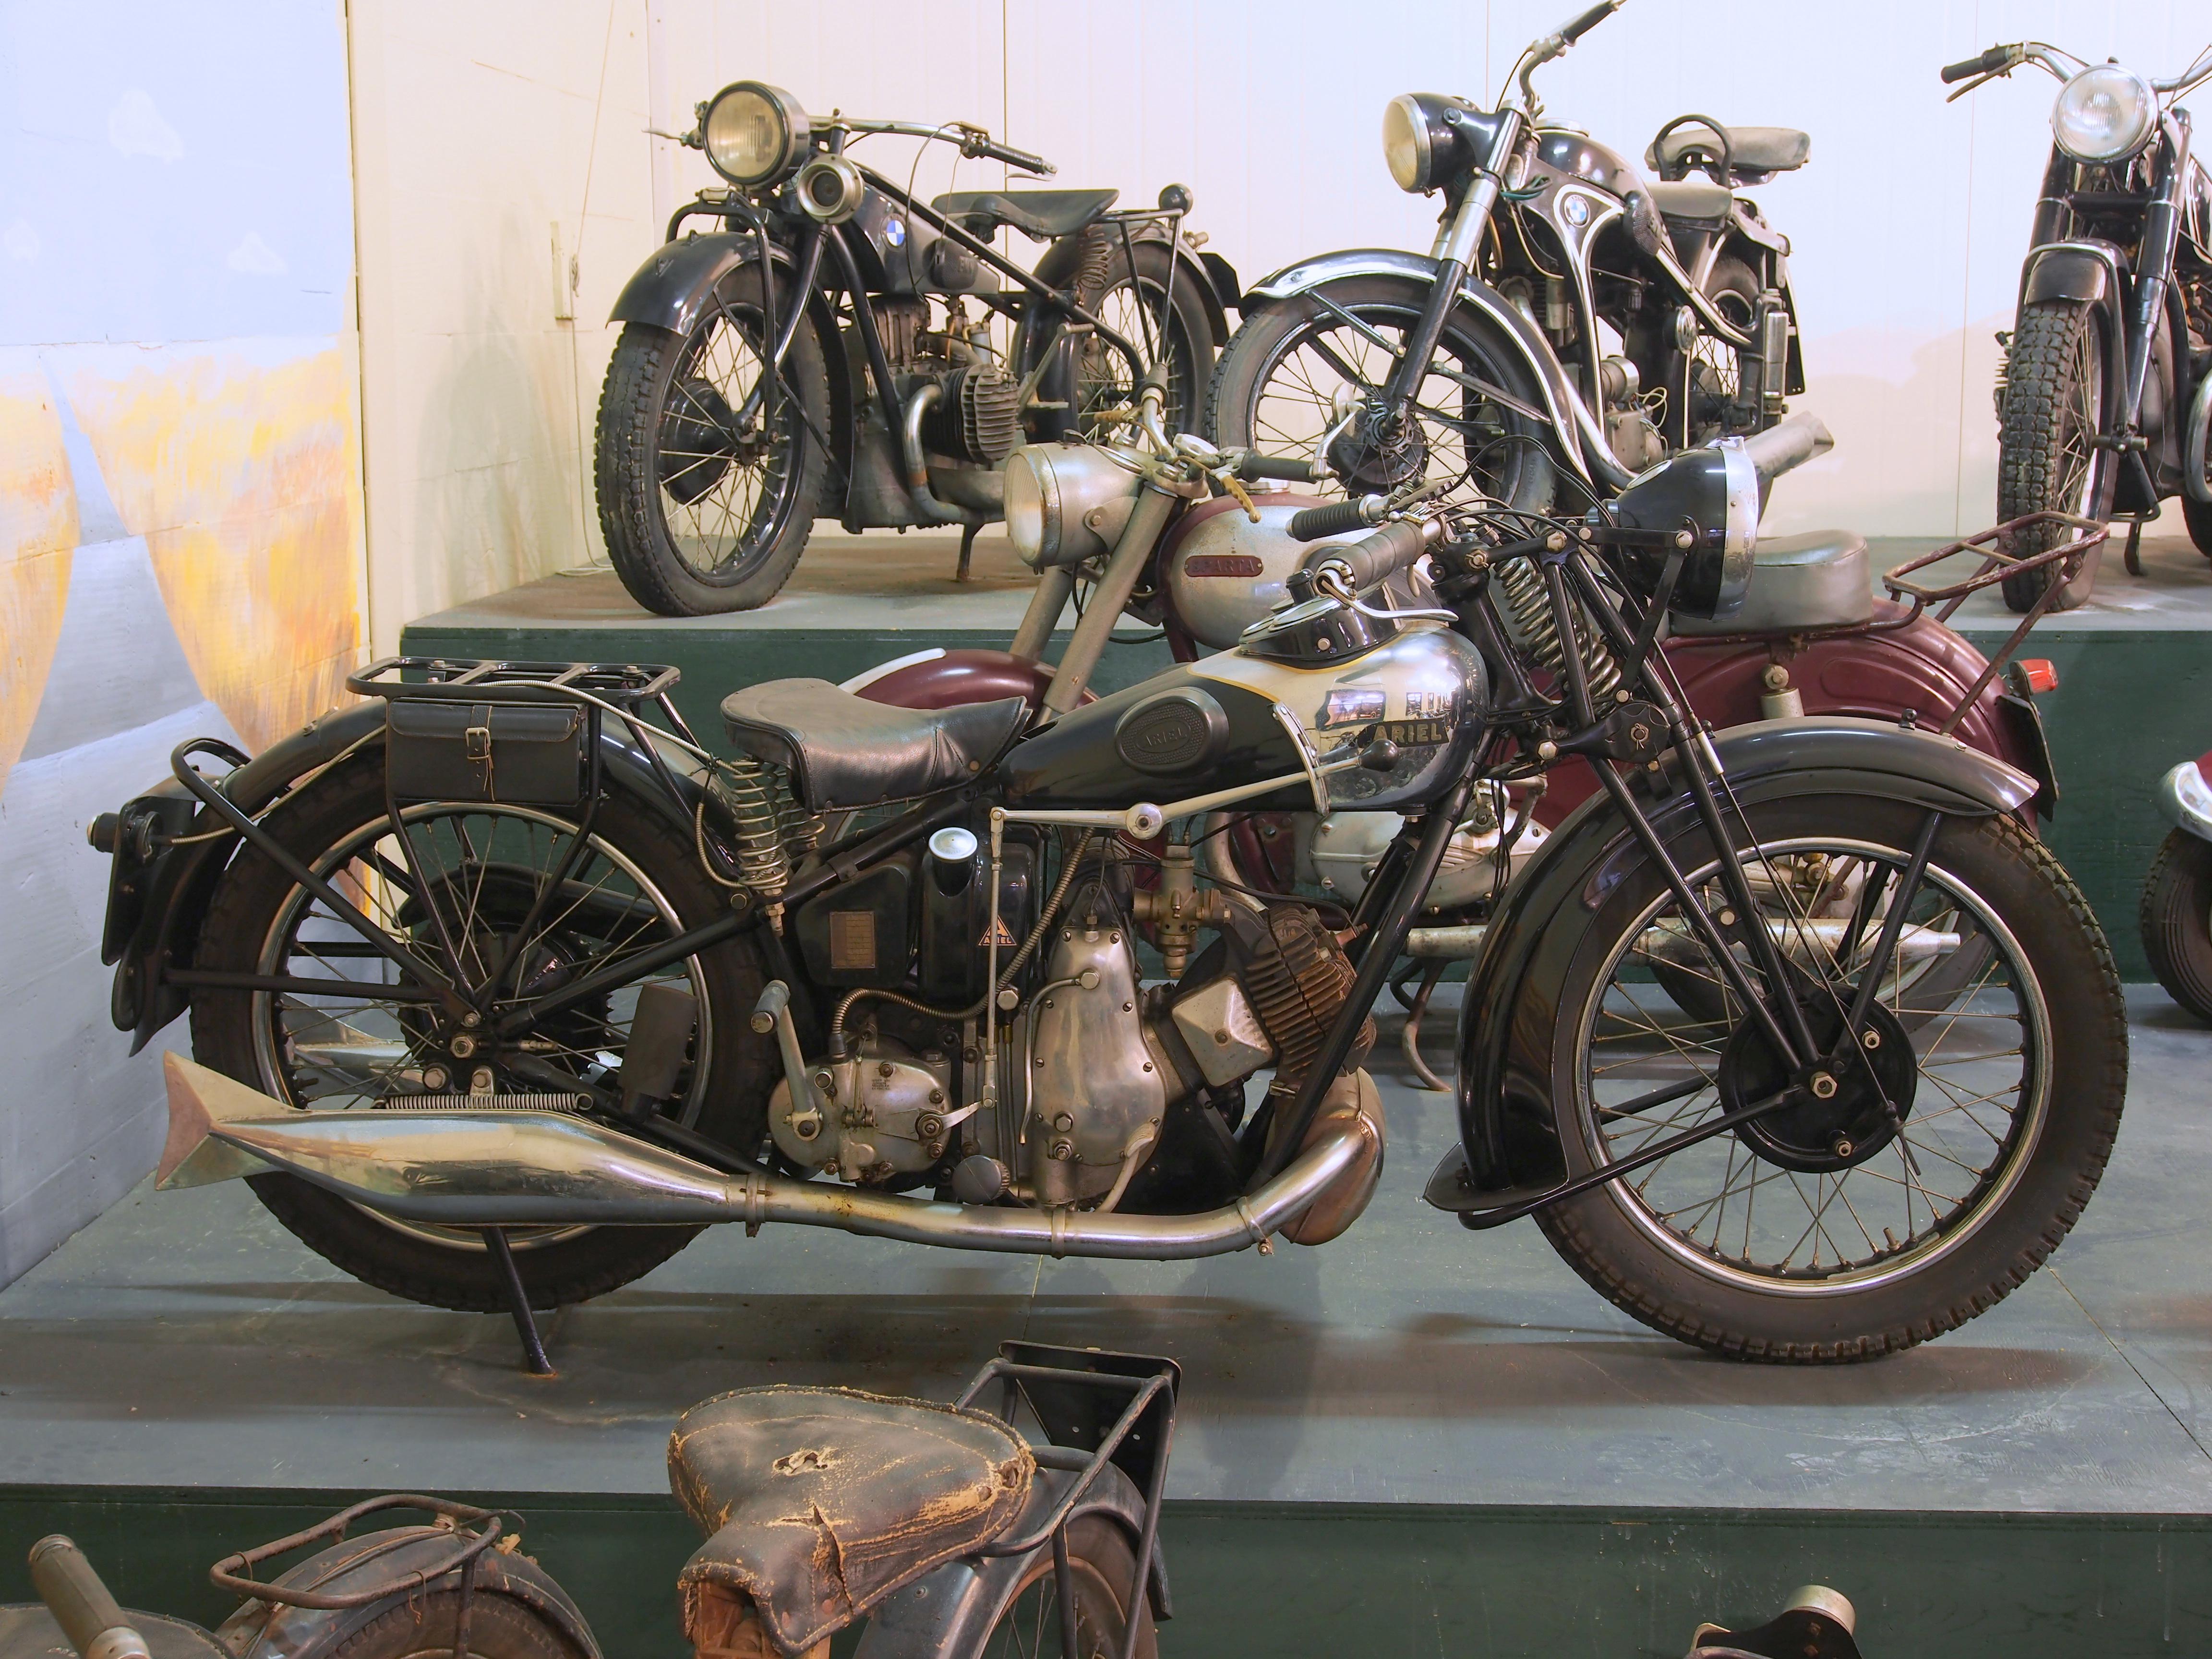 File:Old Ariel motorcycle.JPG - Wikimedia Commons